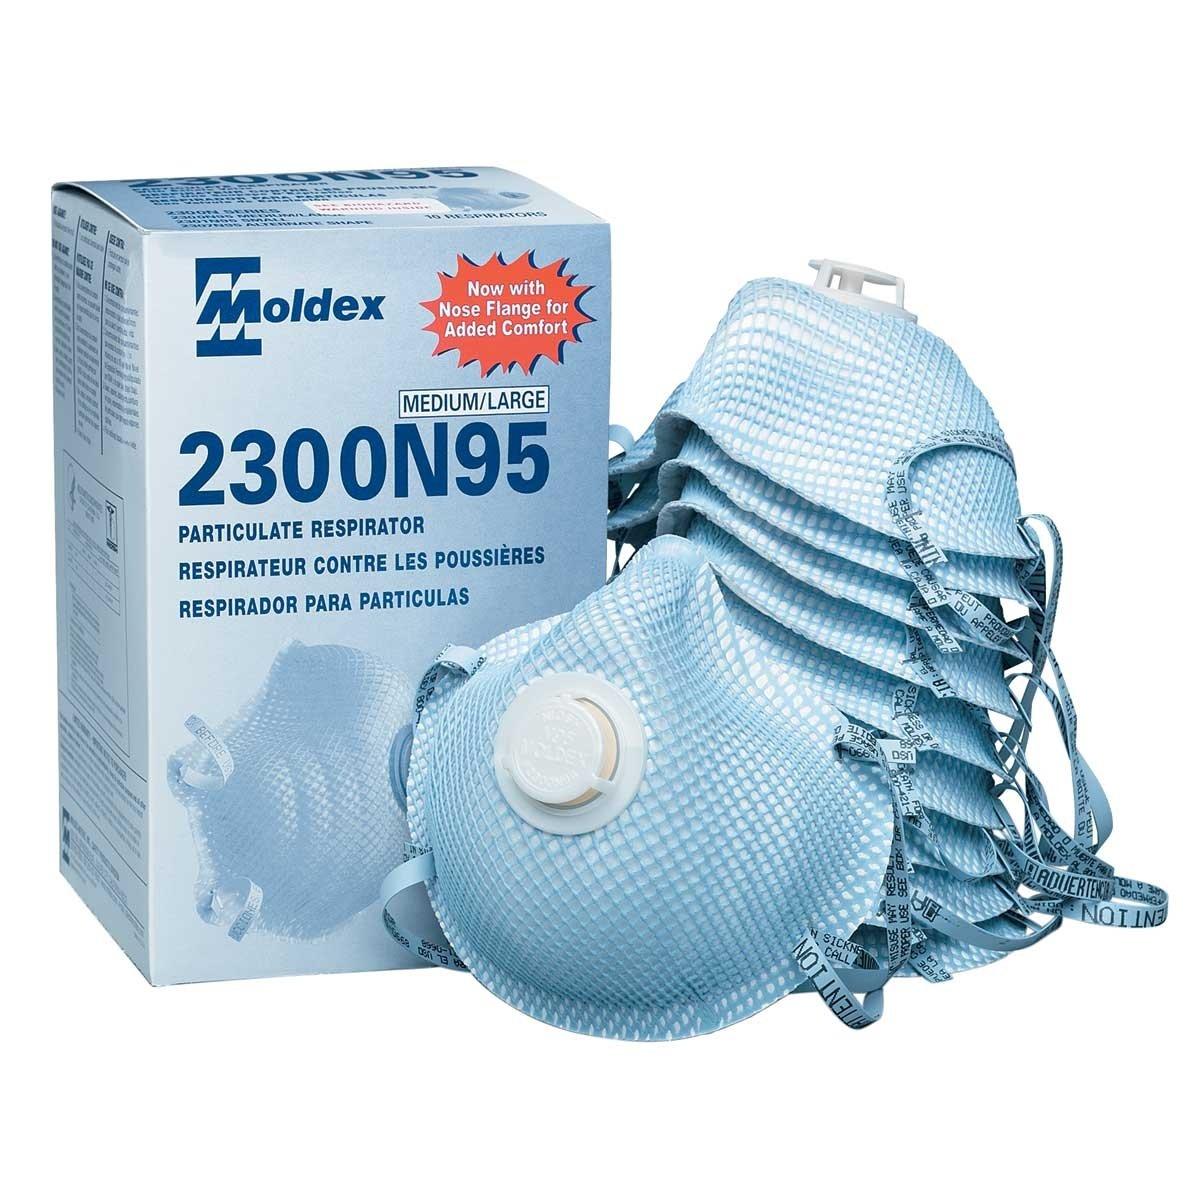 Moldex 2300N95 Particulate Respirator (1 case-